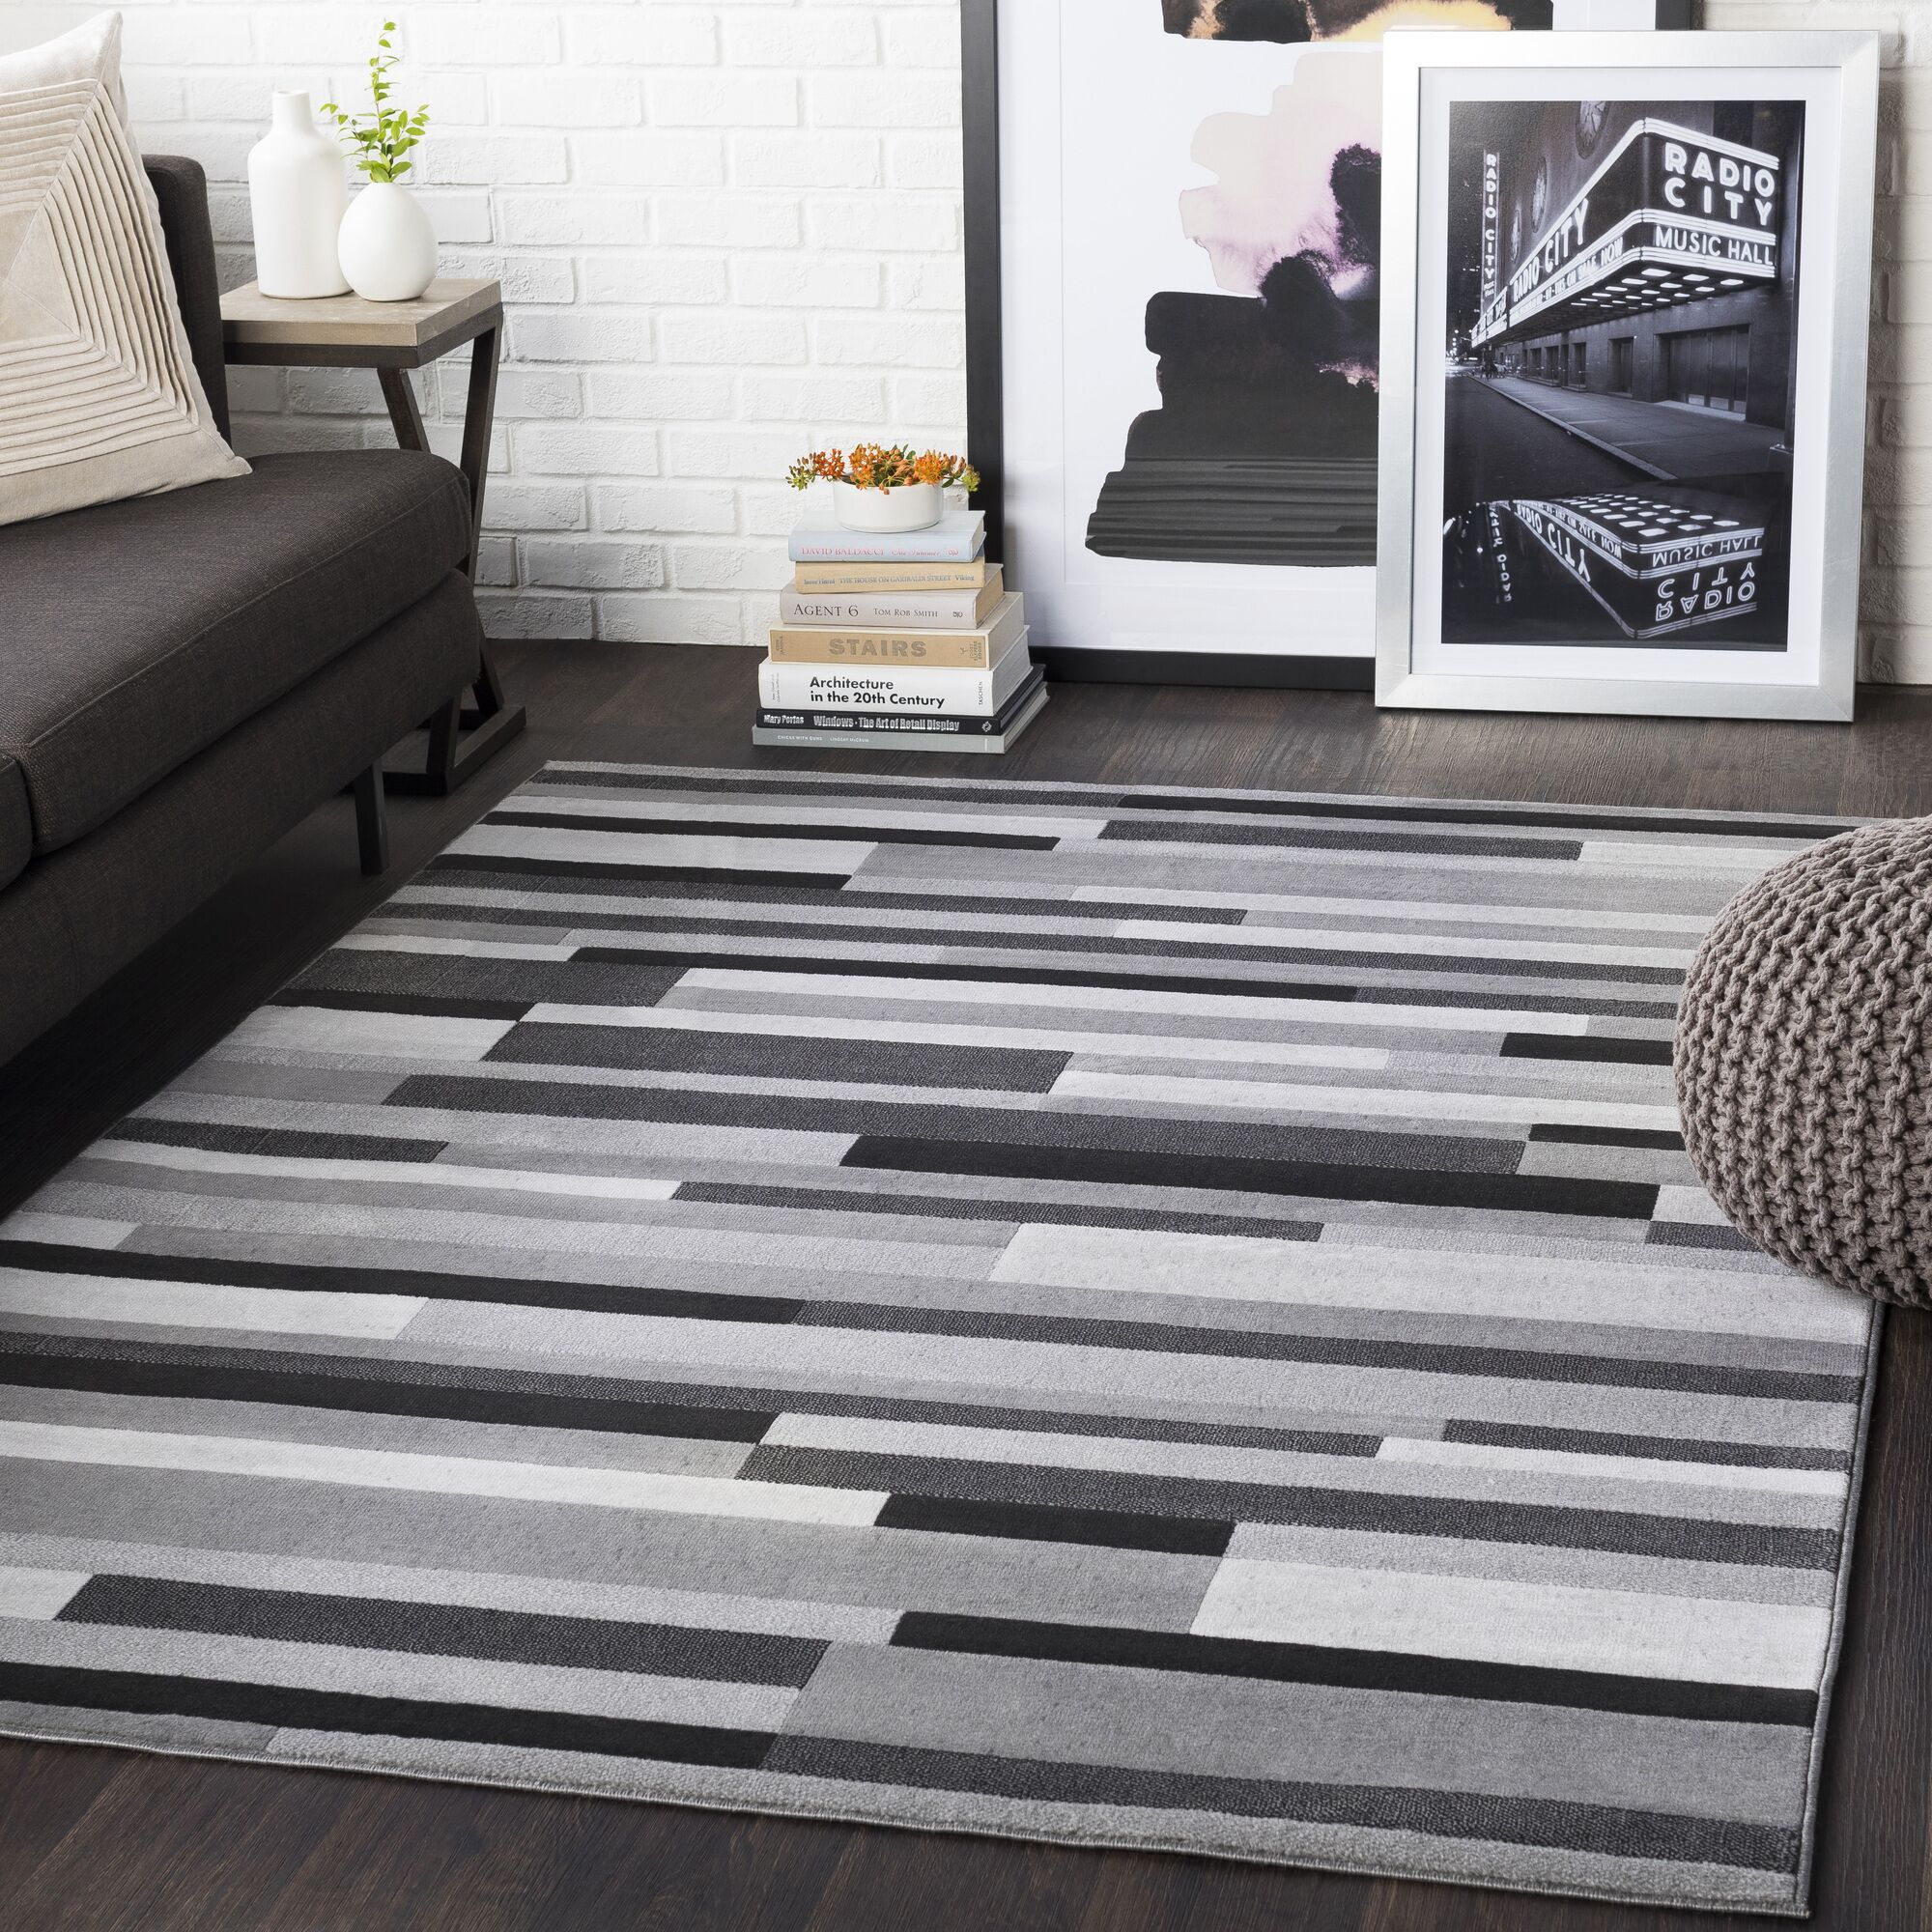 Huerta Striped Light Gray/Taupe Area Rug Rug Size: Rectangle 3'11